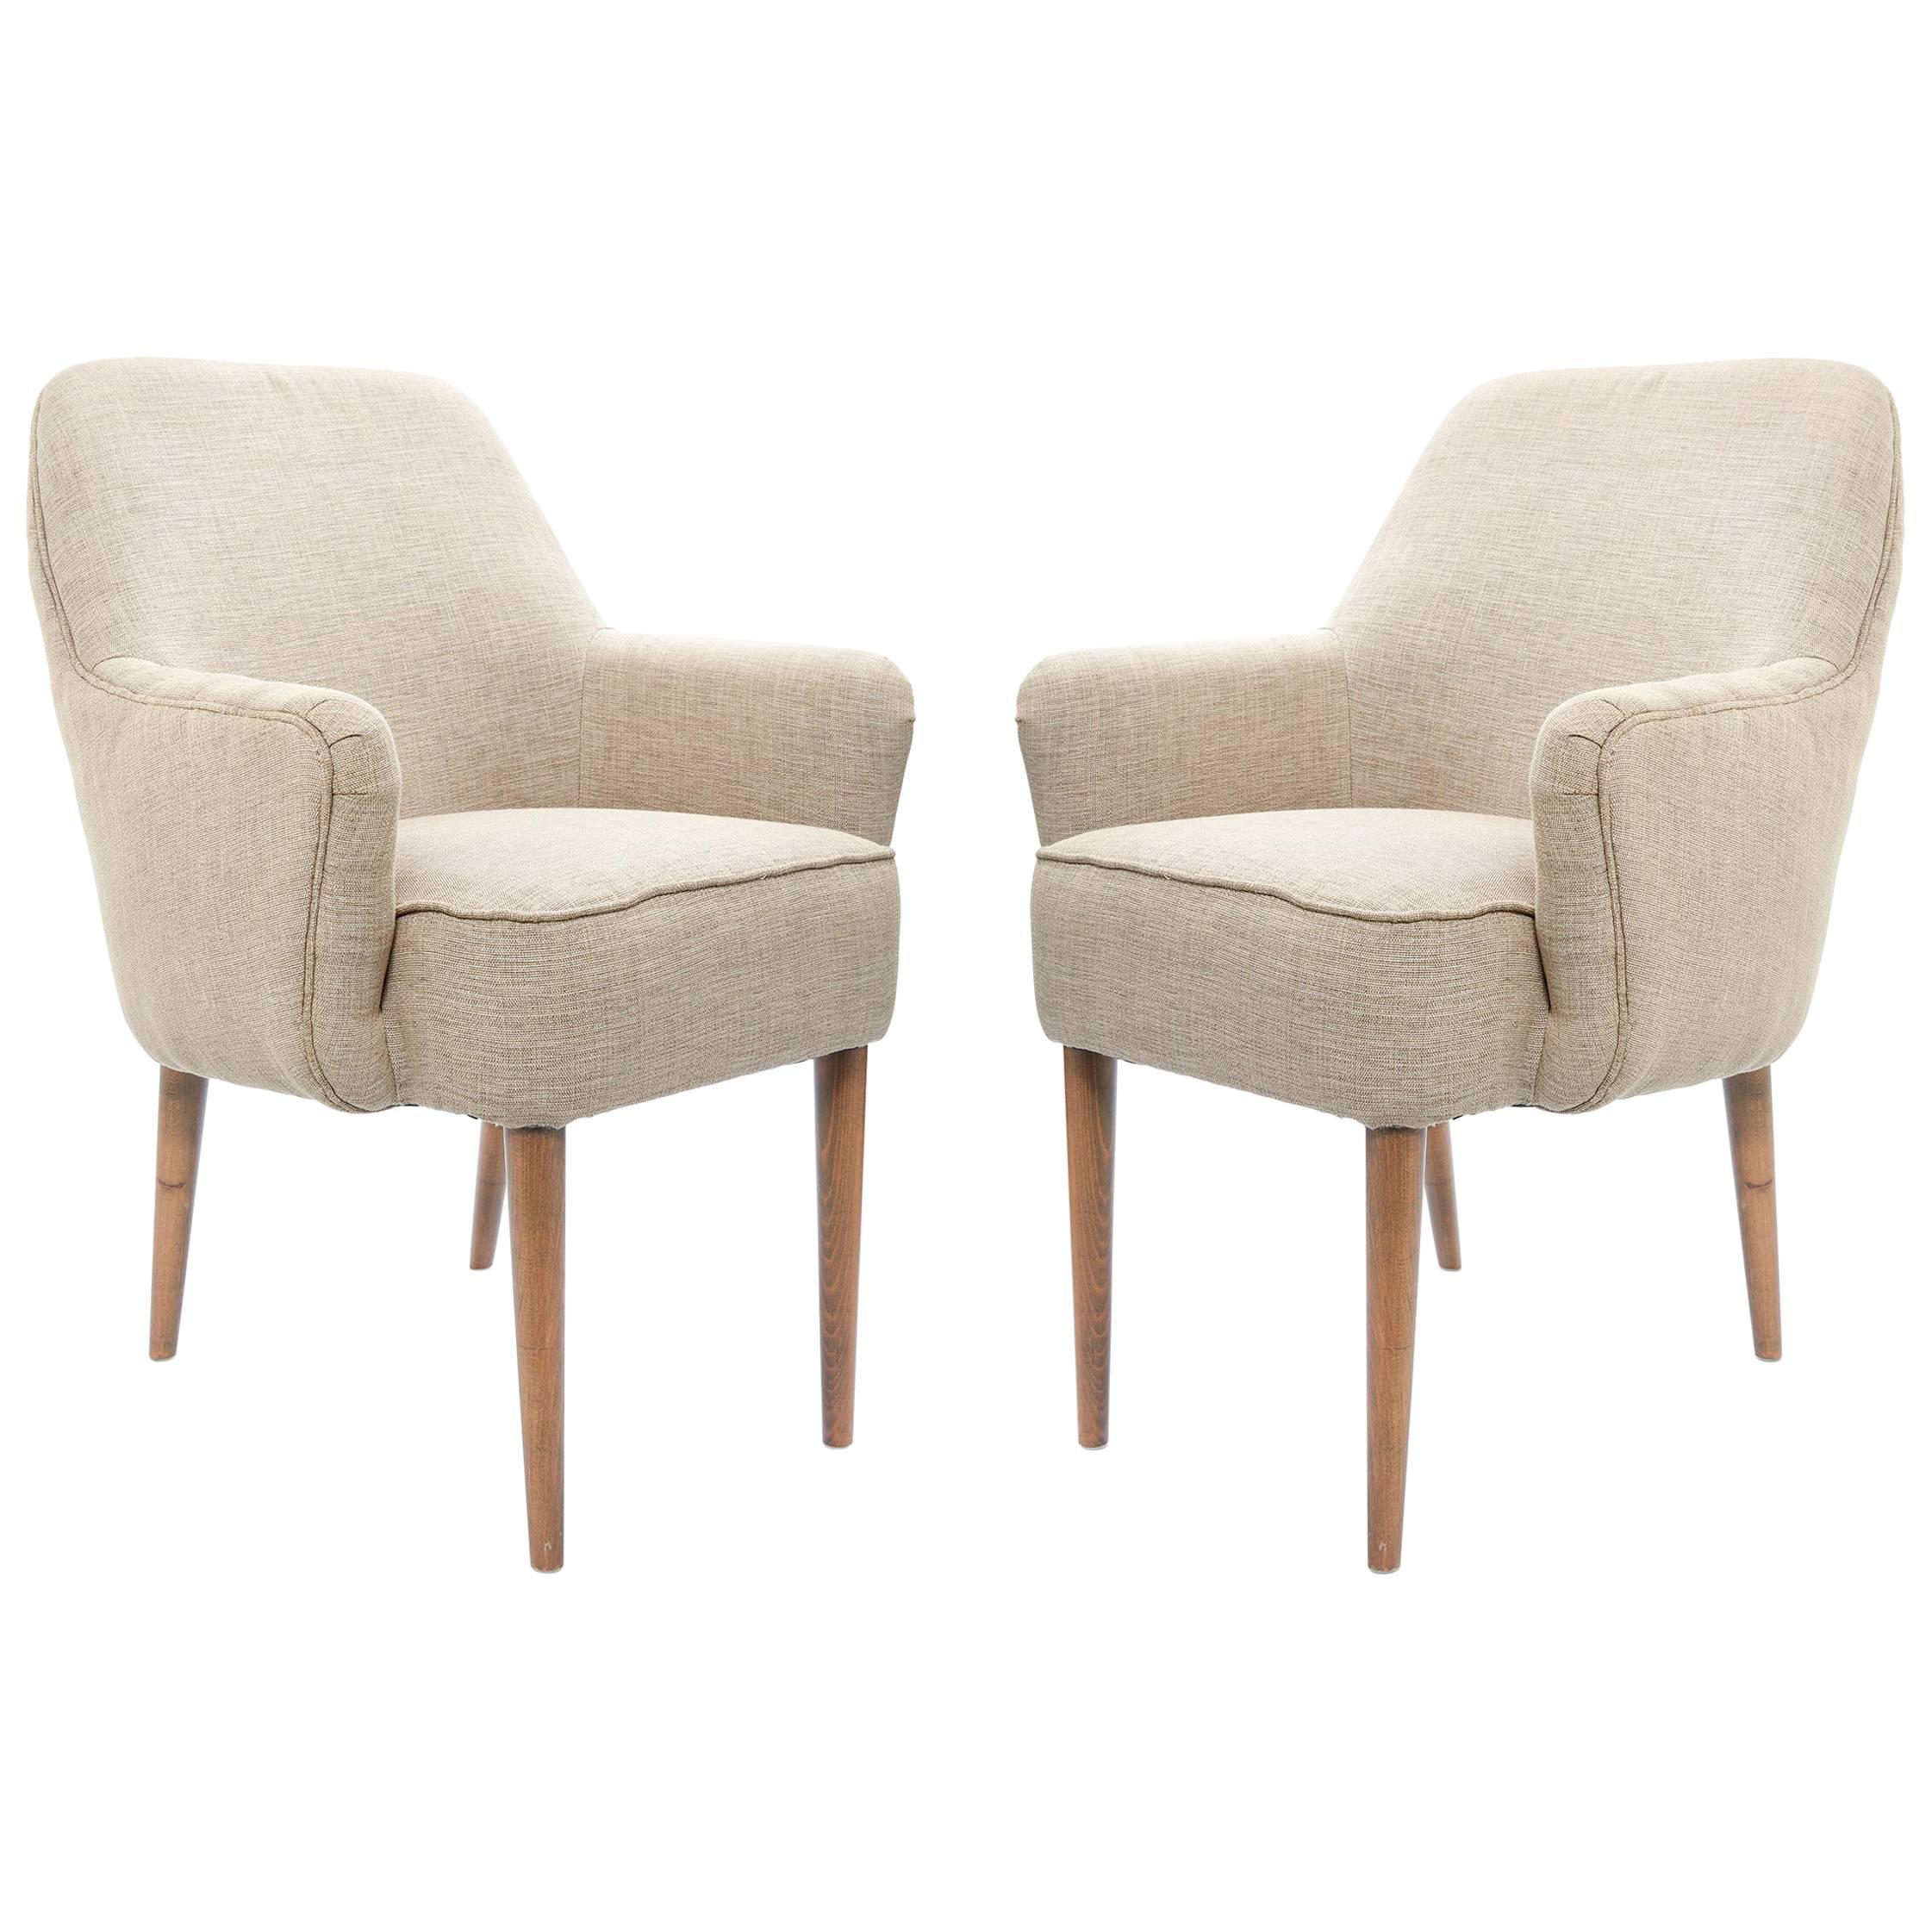 Midcentury Pair of Danish Petite Newly Upholstered Armchairs